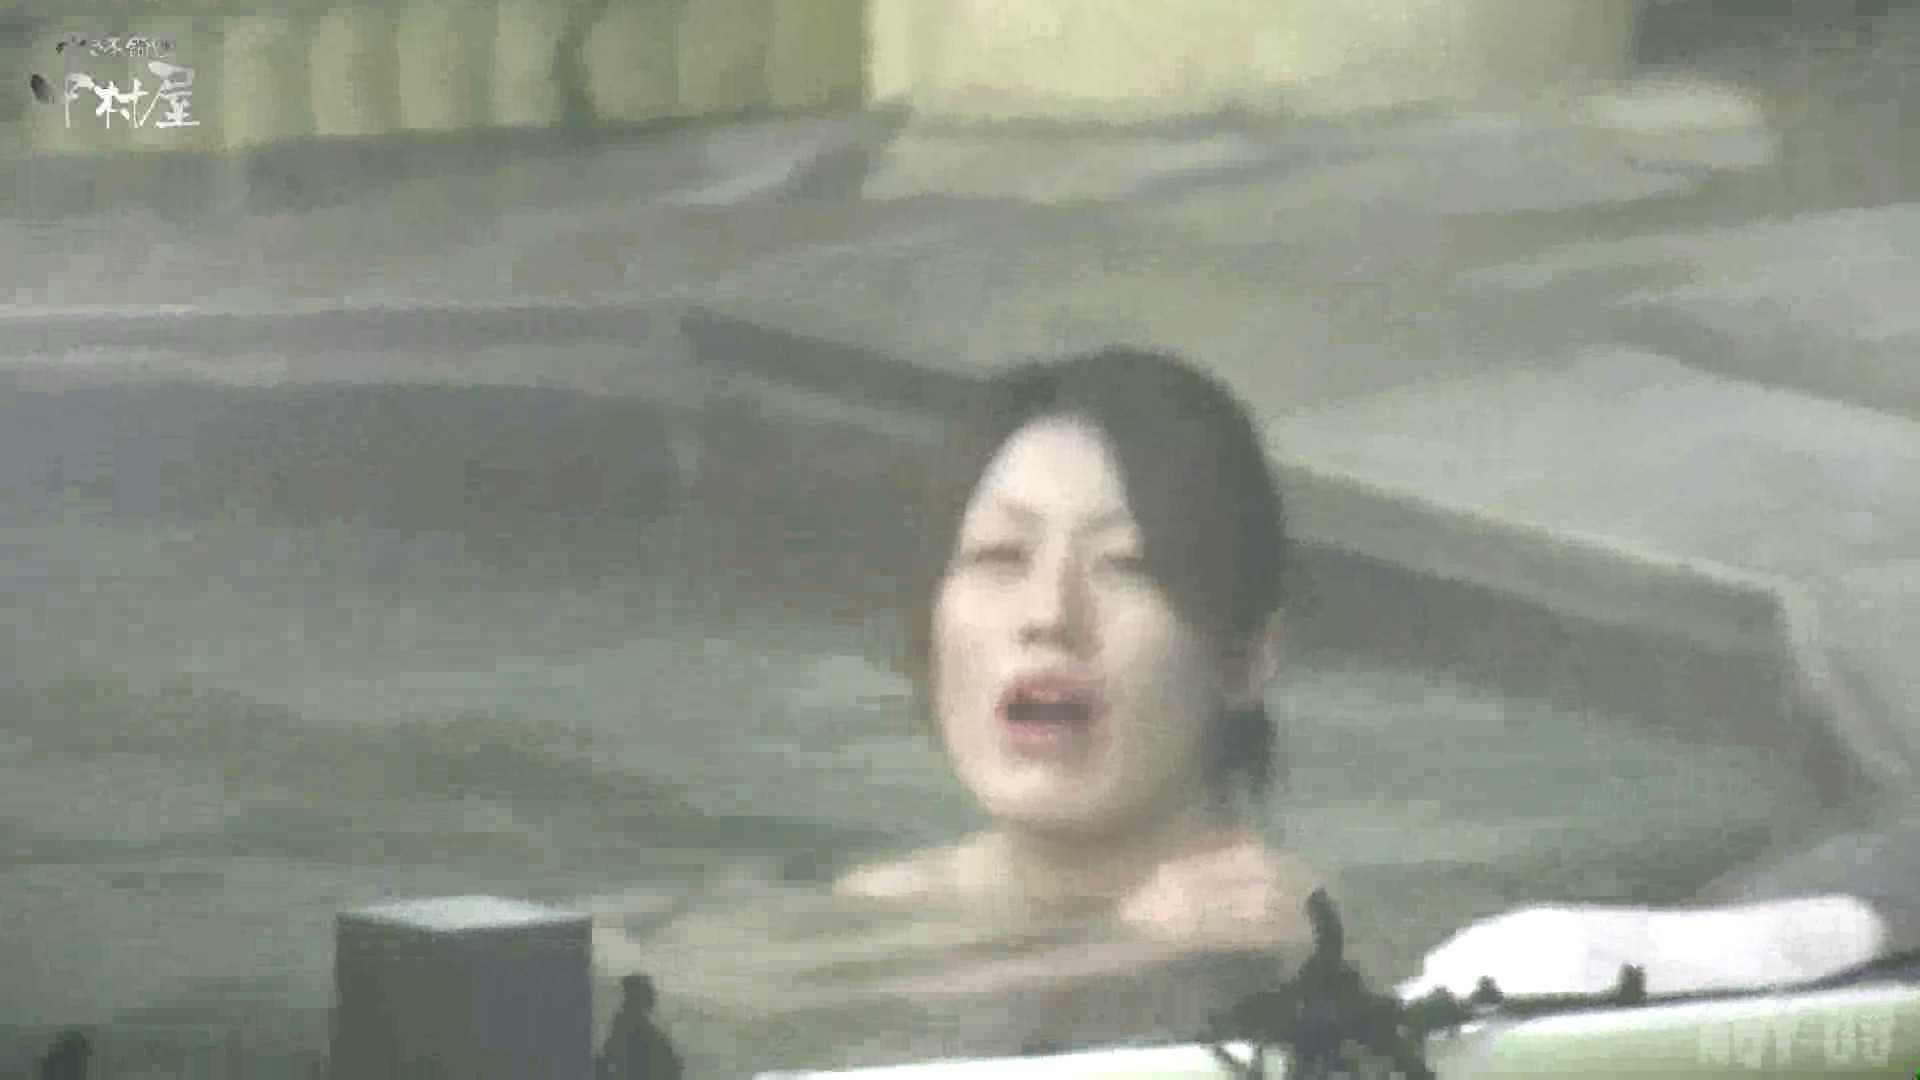 Aquaな露天風呂Vol.872潜入盗撮露天風呂八判湯 其の三 盗撮 ワレメ無修正動画無料 106画像 38